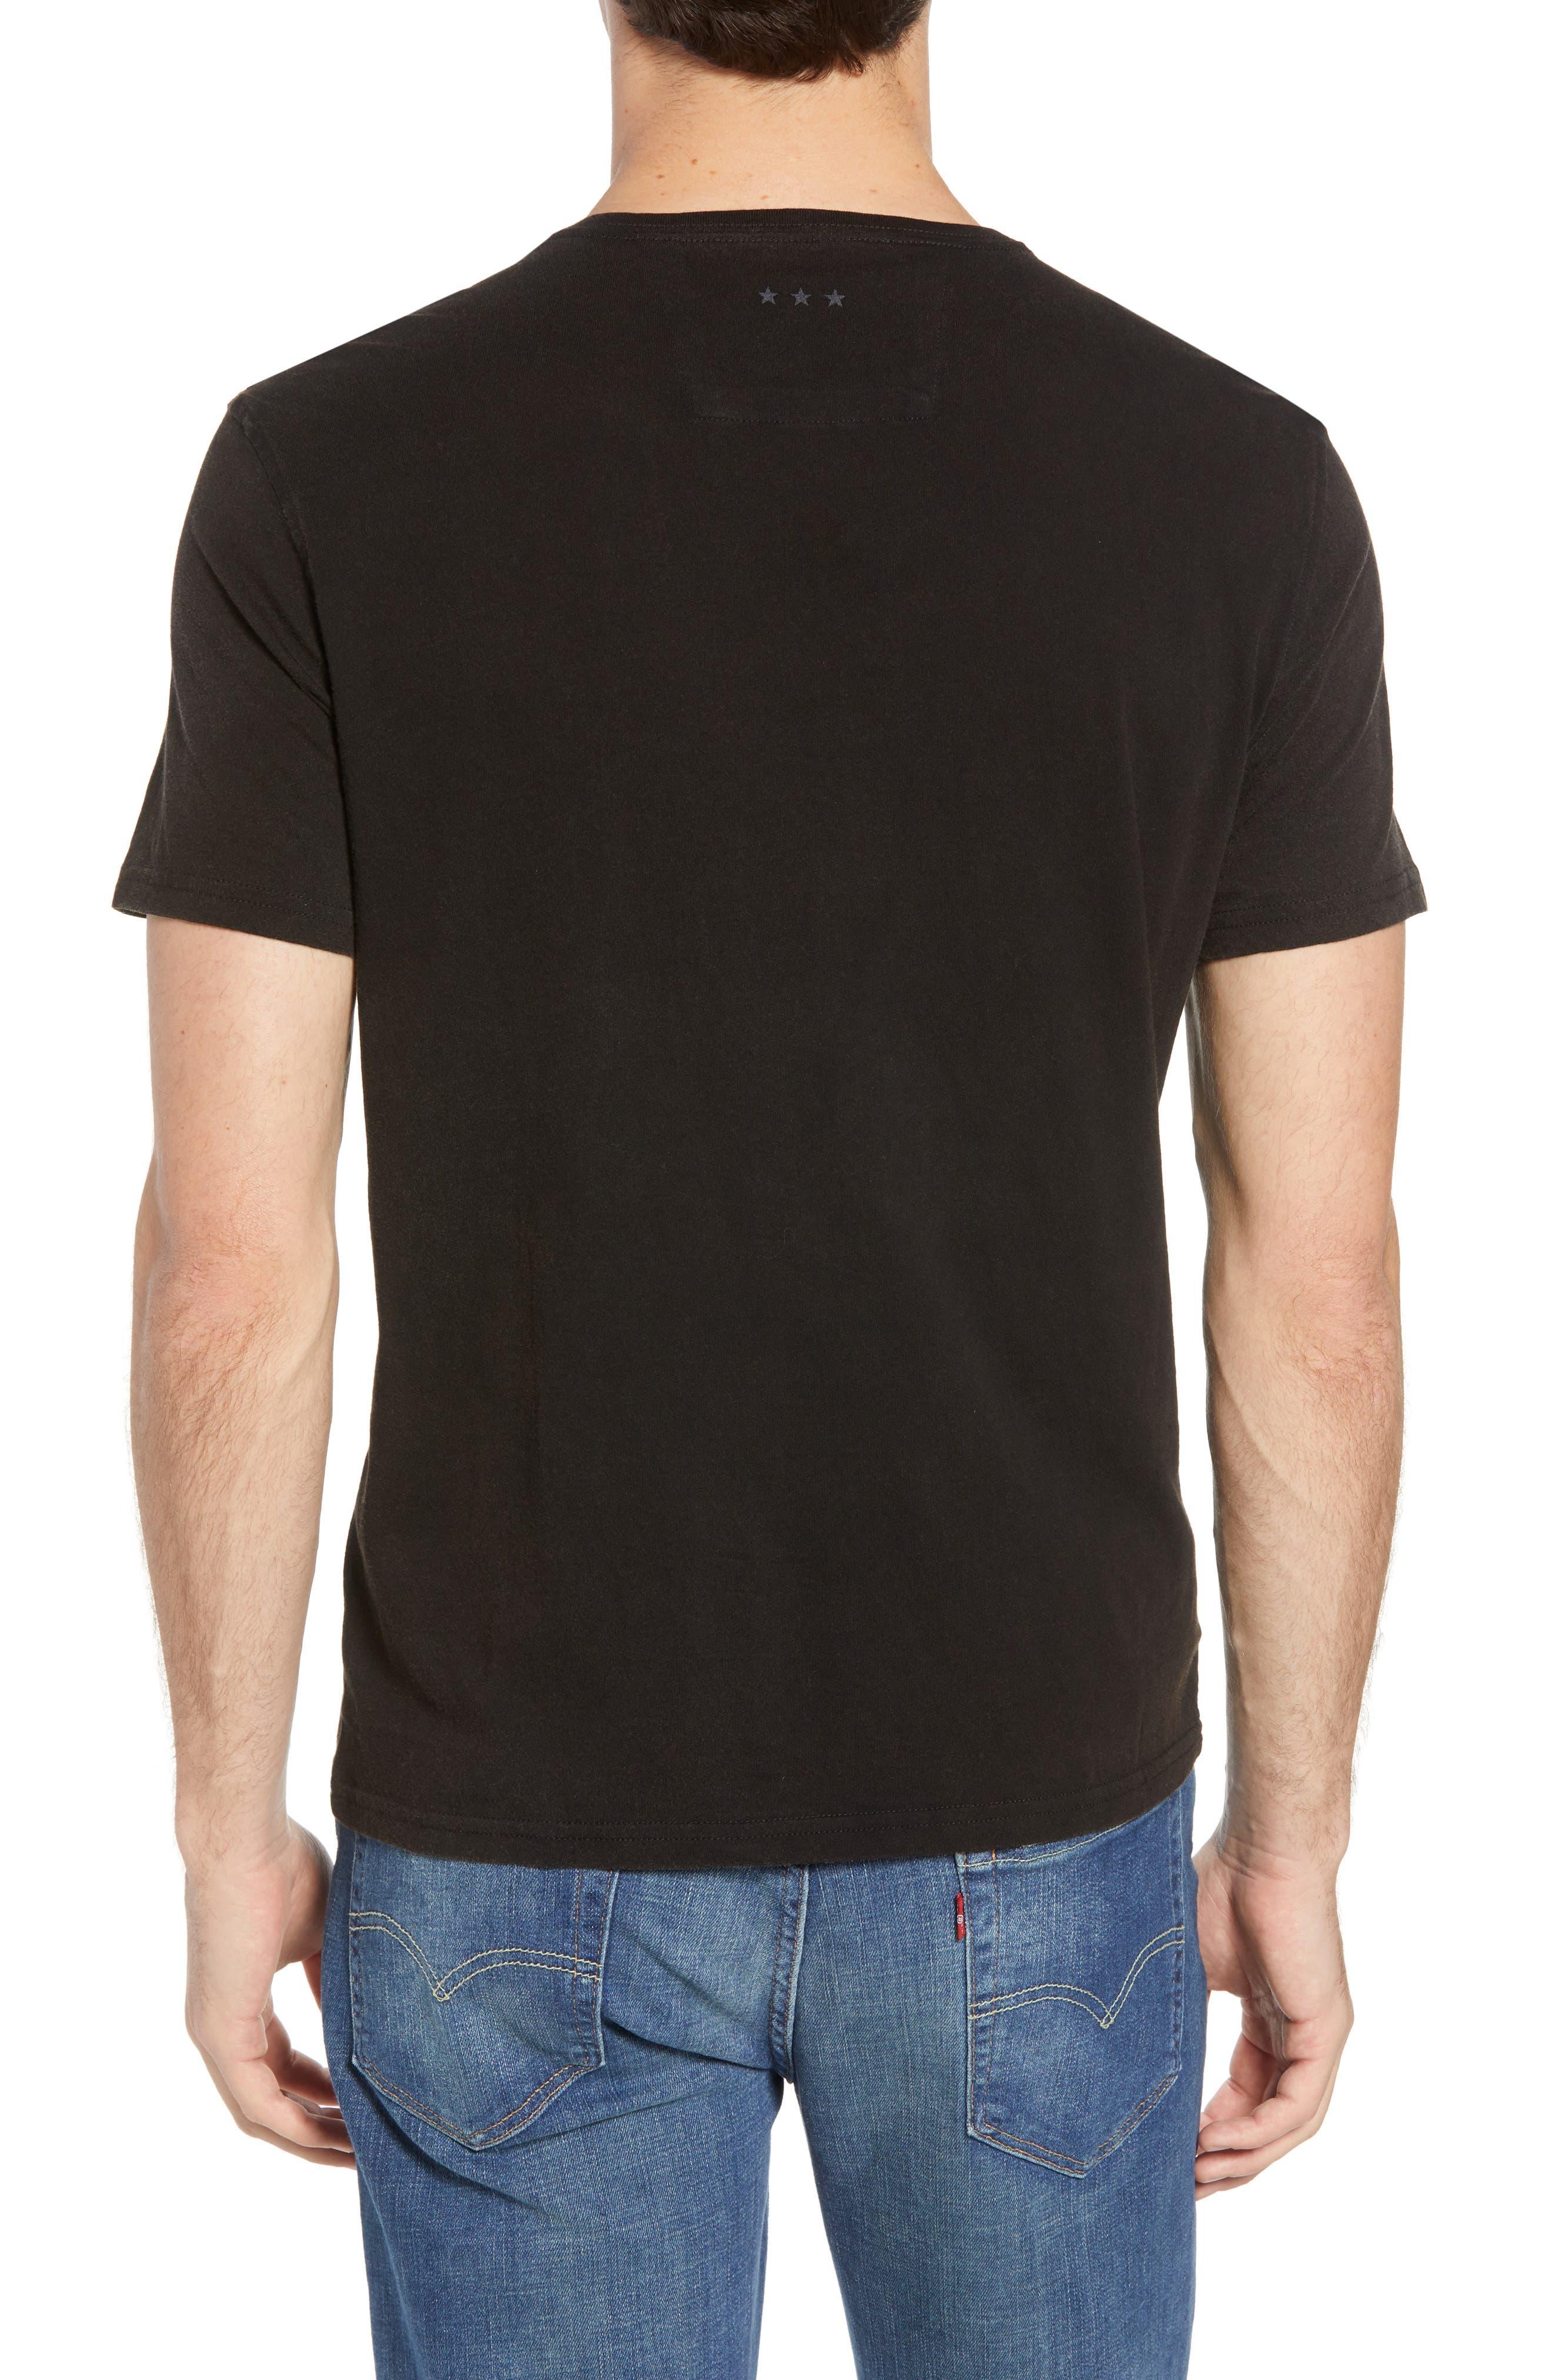 Guitar Rows Crewneck T-Shirt,                             Alternate thumbnail 2, color,